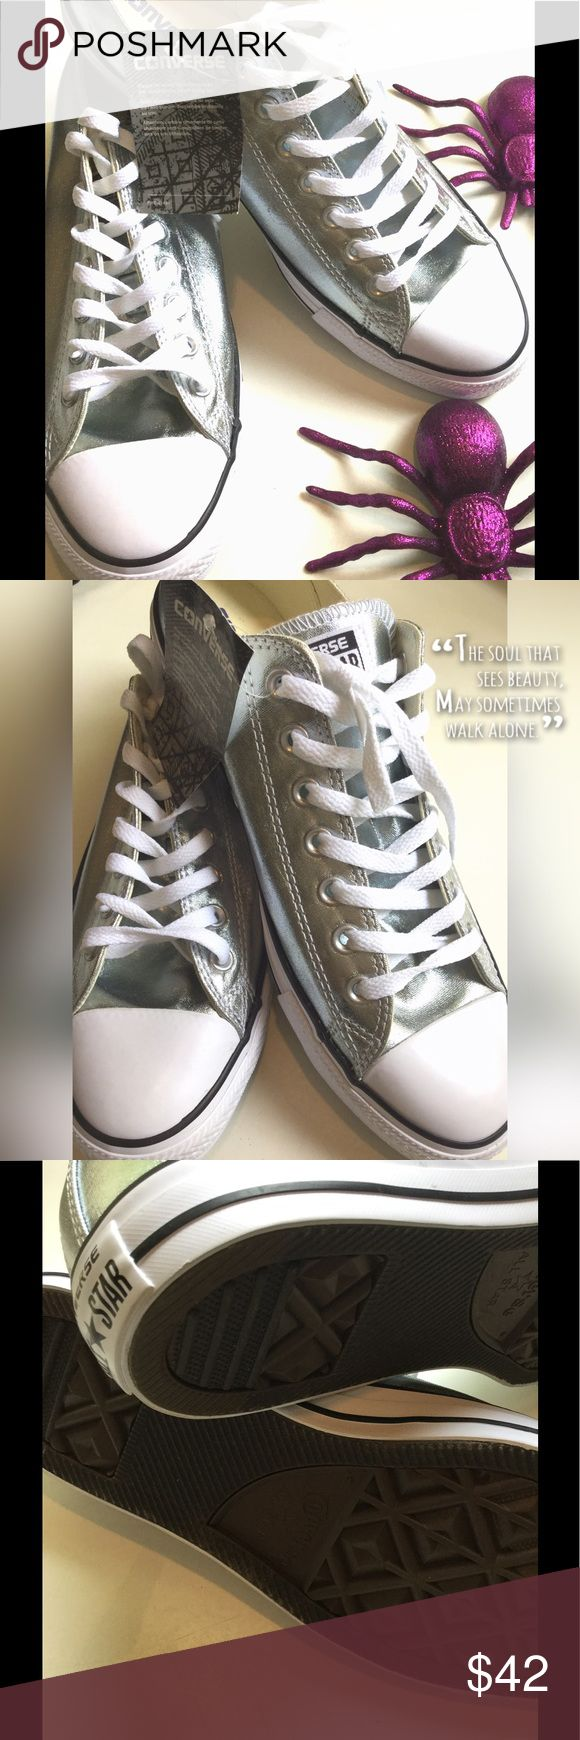 1hr sale Silver converse NWT sz 12 Silver converse NWT sz 12. Super cute awesome shoes. Converse Shoes Athletic Shoes